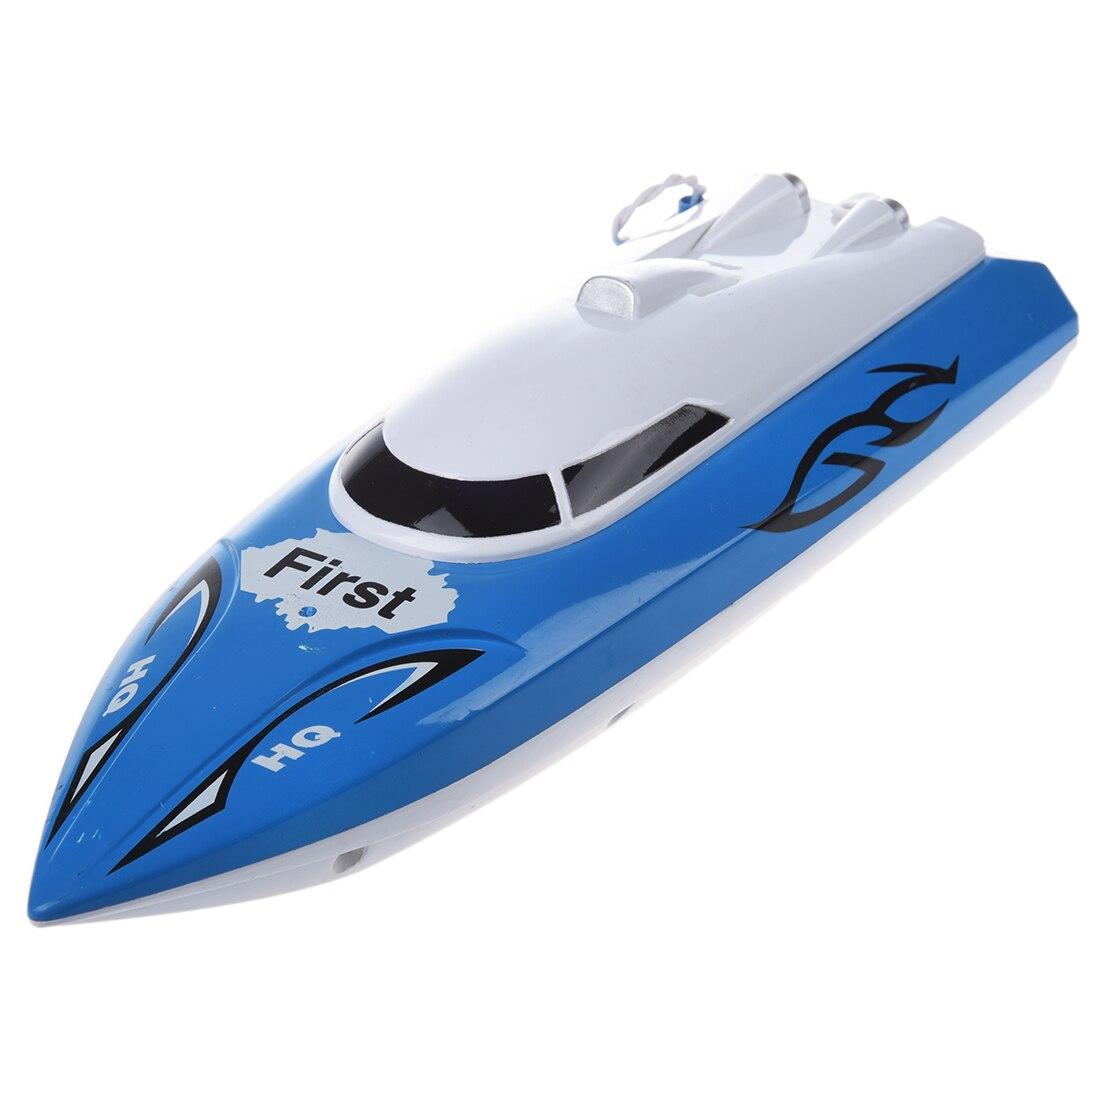 10 inch Mini RC Boat Radio Remote Control RTR Electric Dual Motor Toy Colour:Blue happy cow 777 218 remote control mini rc racing boat model